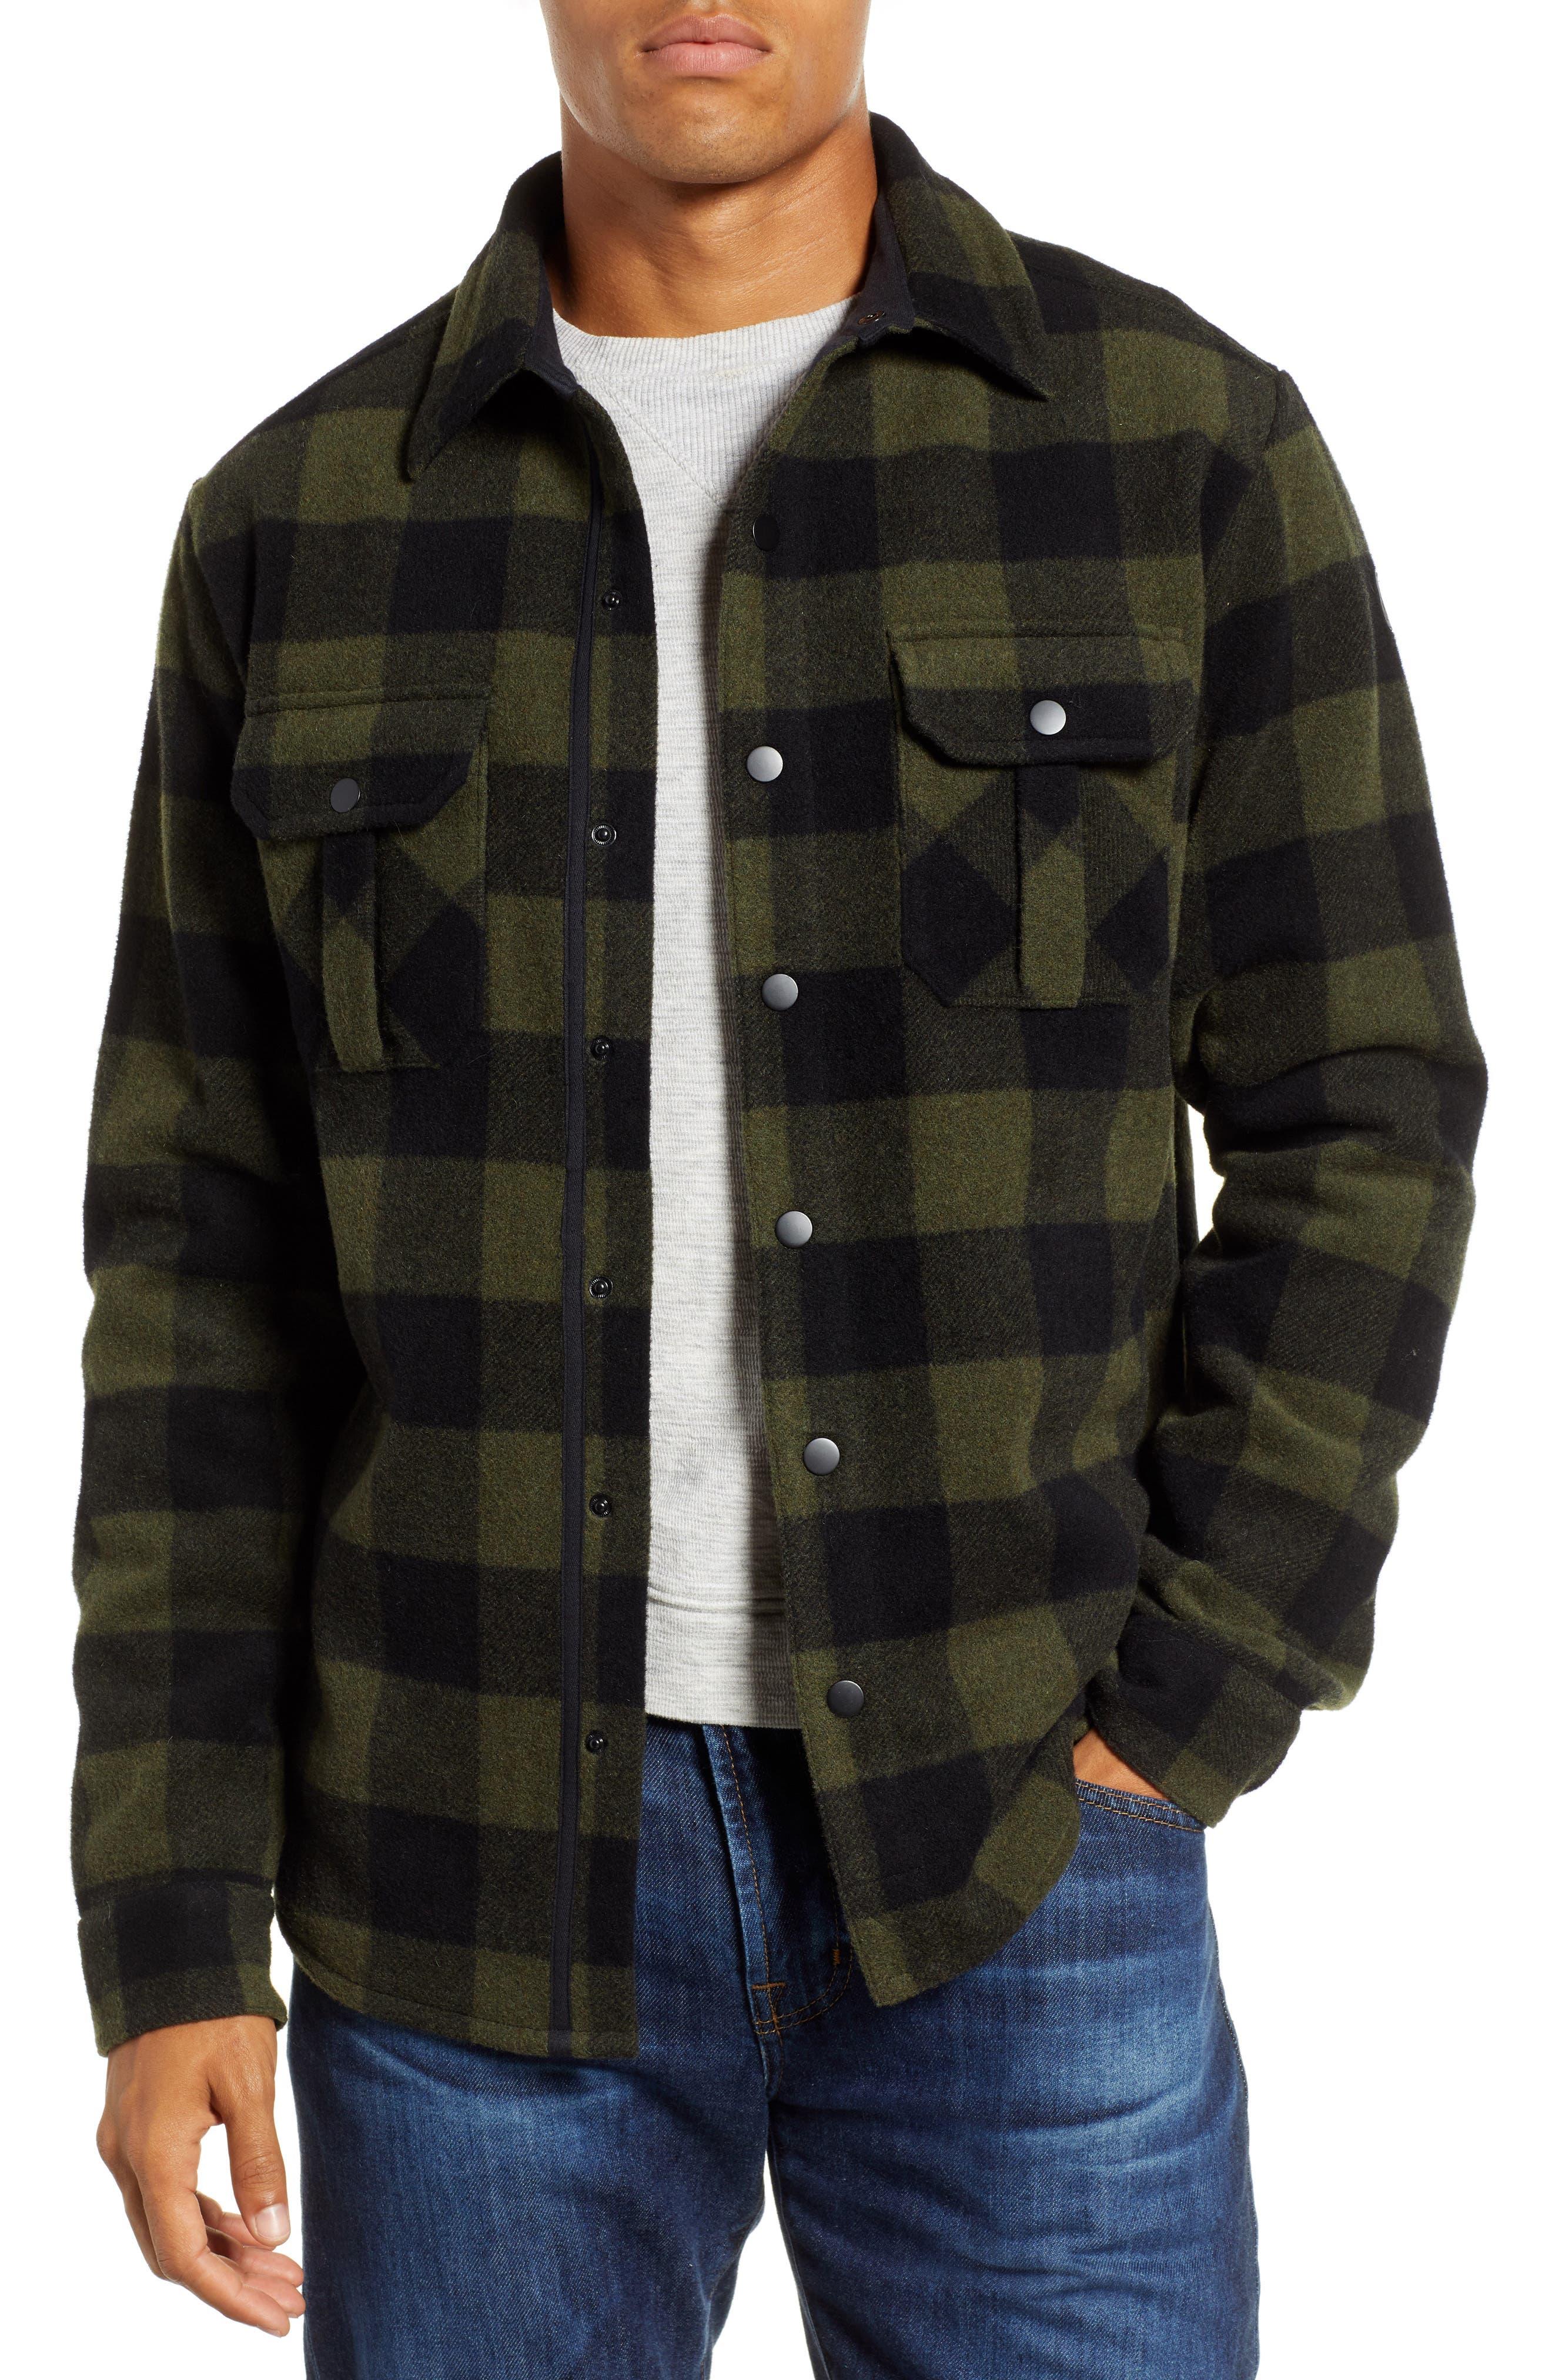 Smartwool Anchor Line Flannel Shirt Jacket